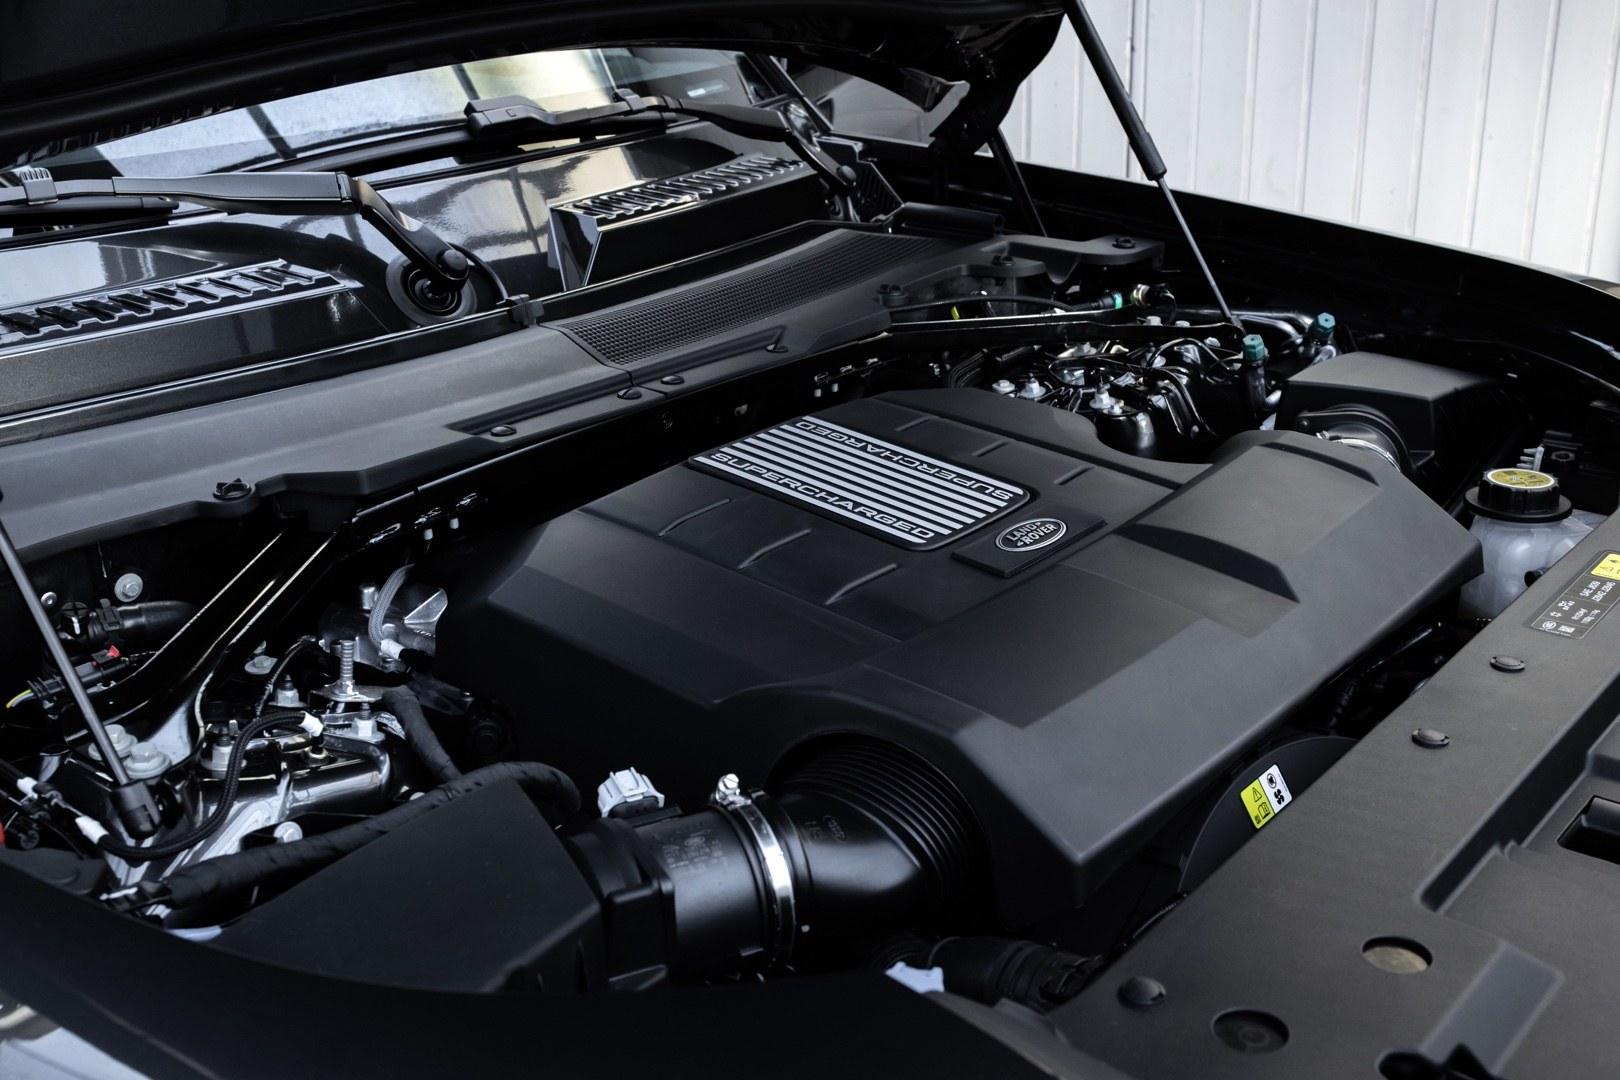 LR_DEF_V8_ENGINE_22MY_250221_02